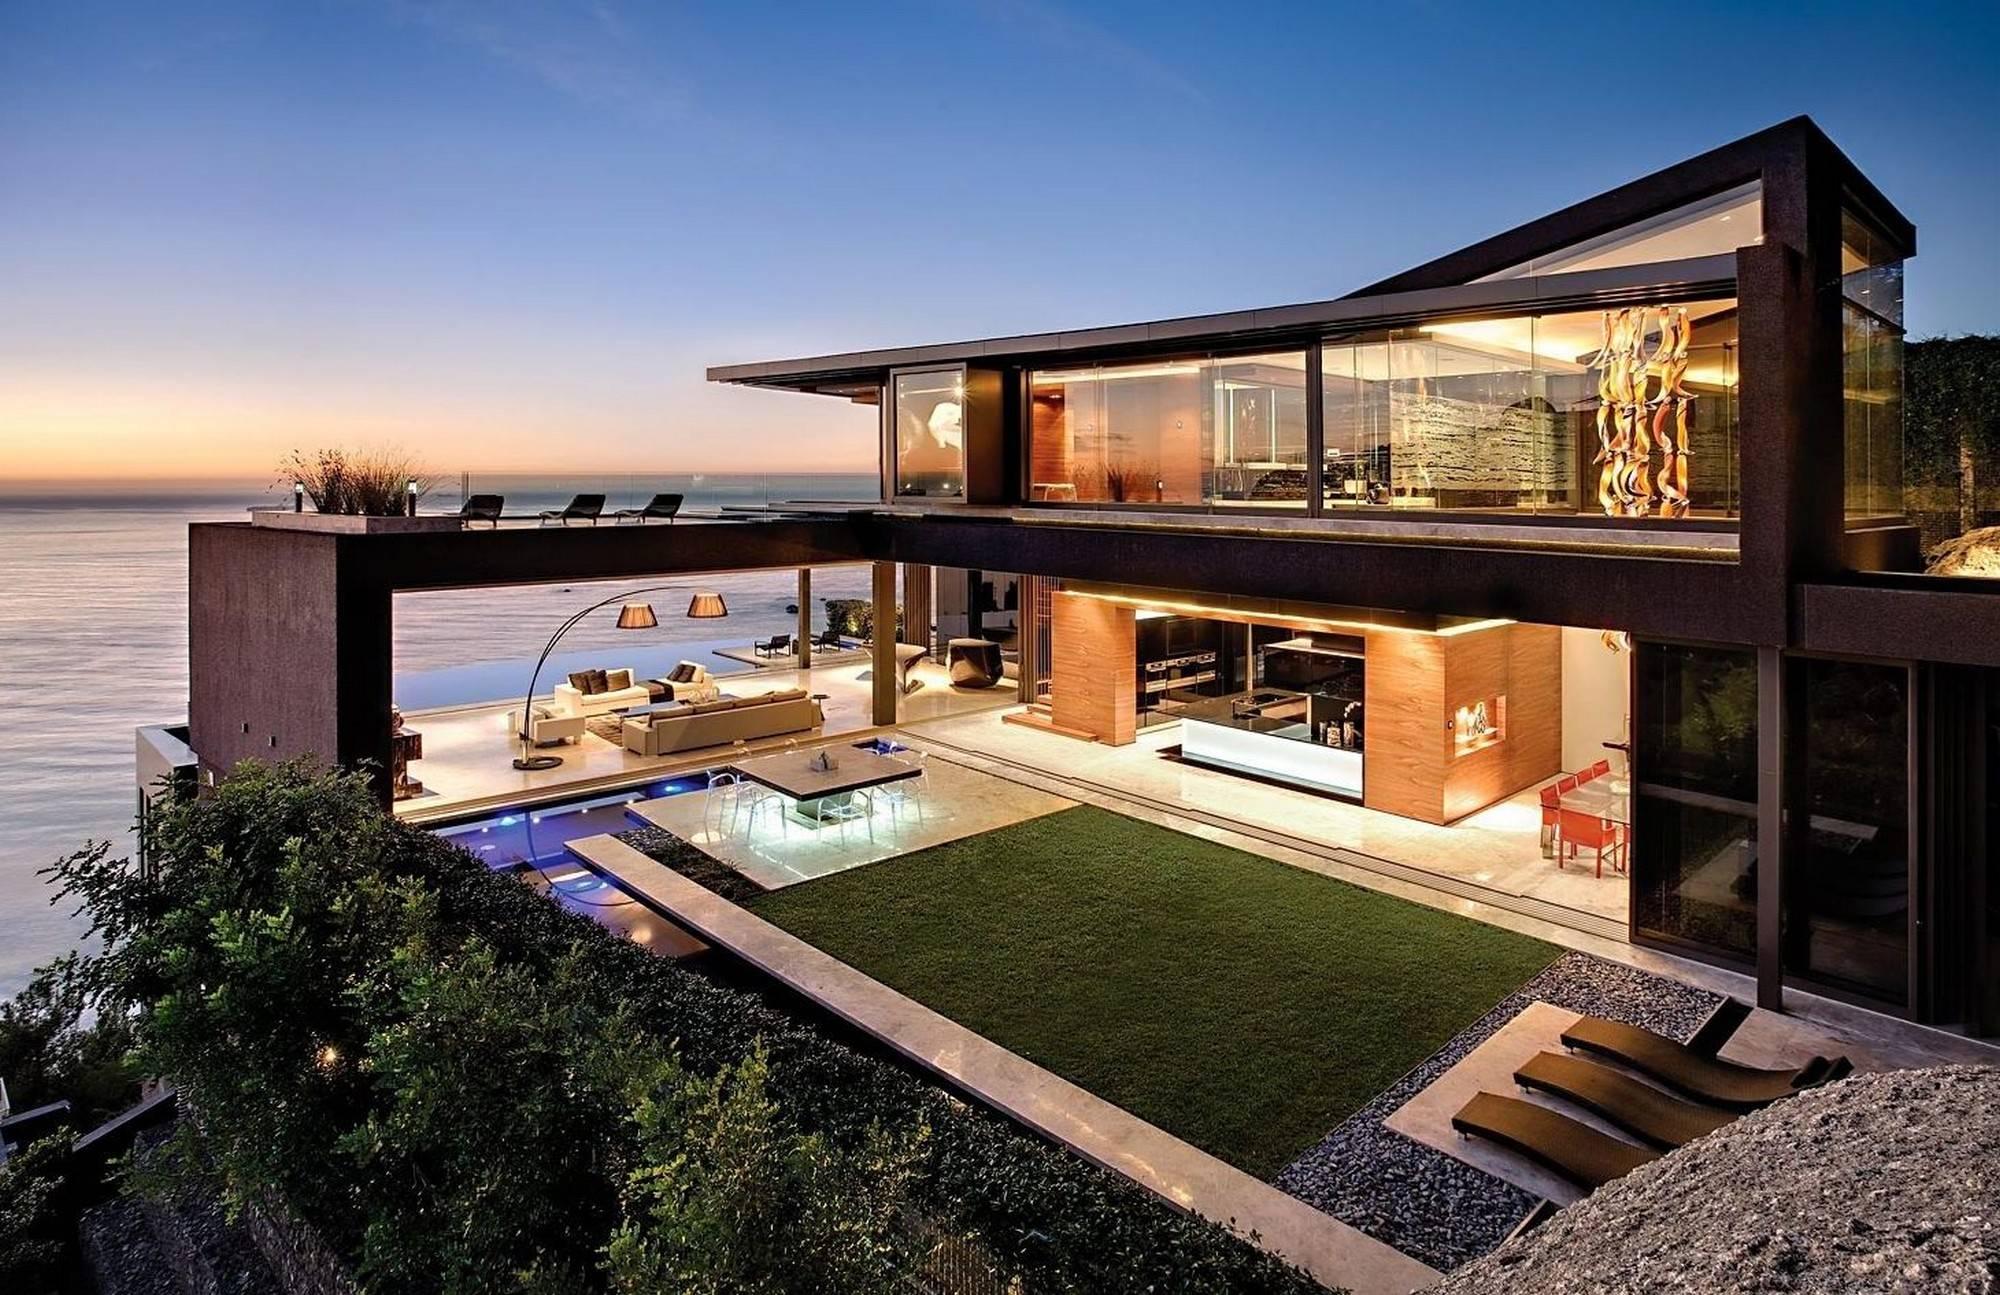 House luxury beach home designs courtyards design